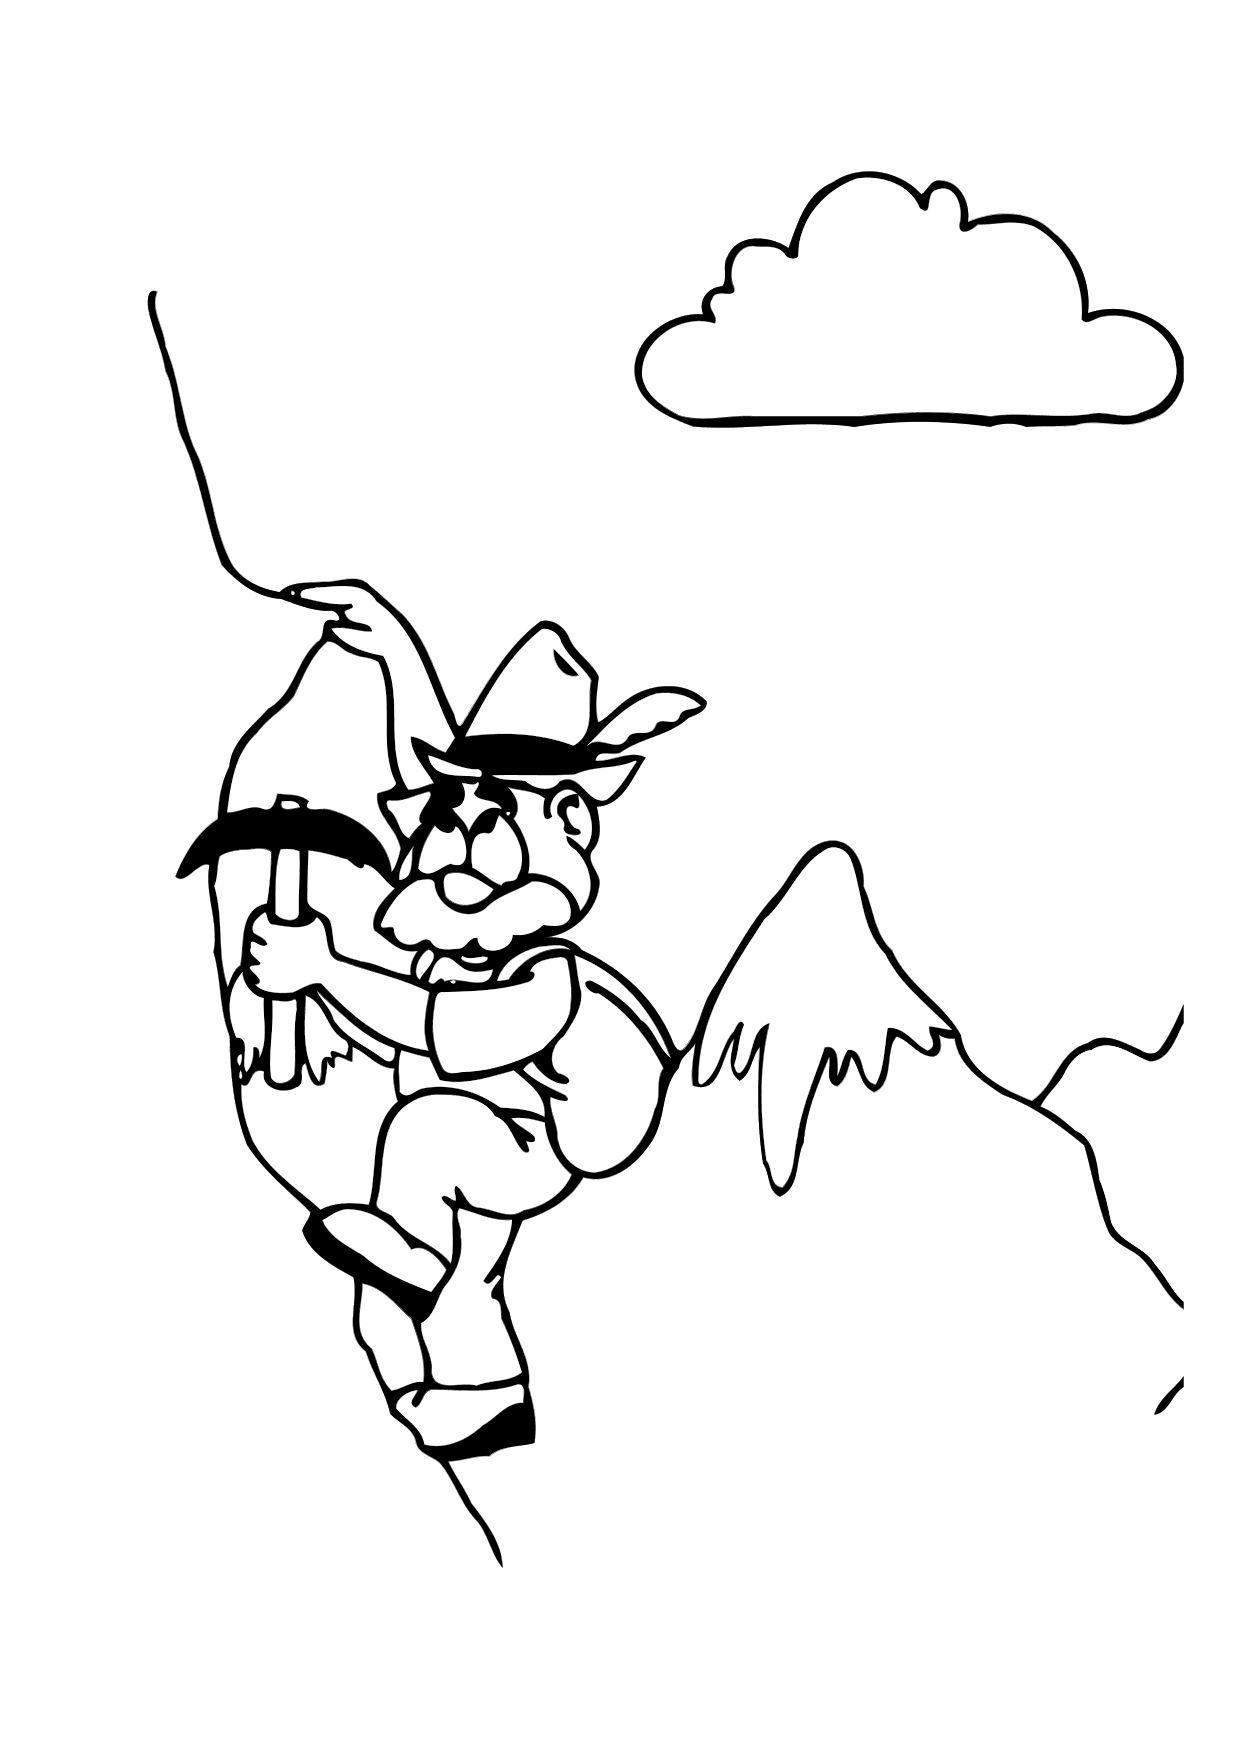 Dibujo para colorear Alpinista - Img 12166